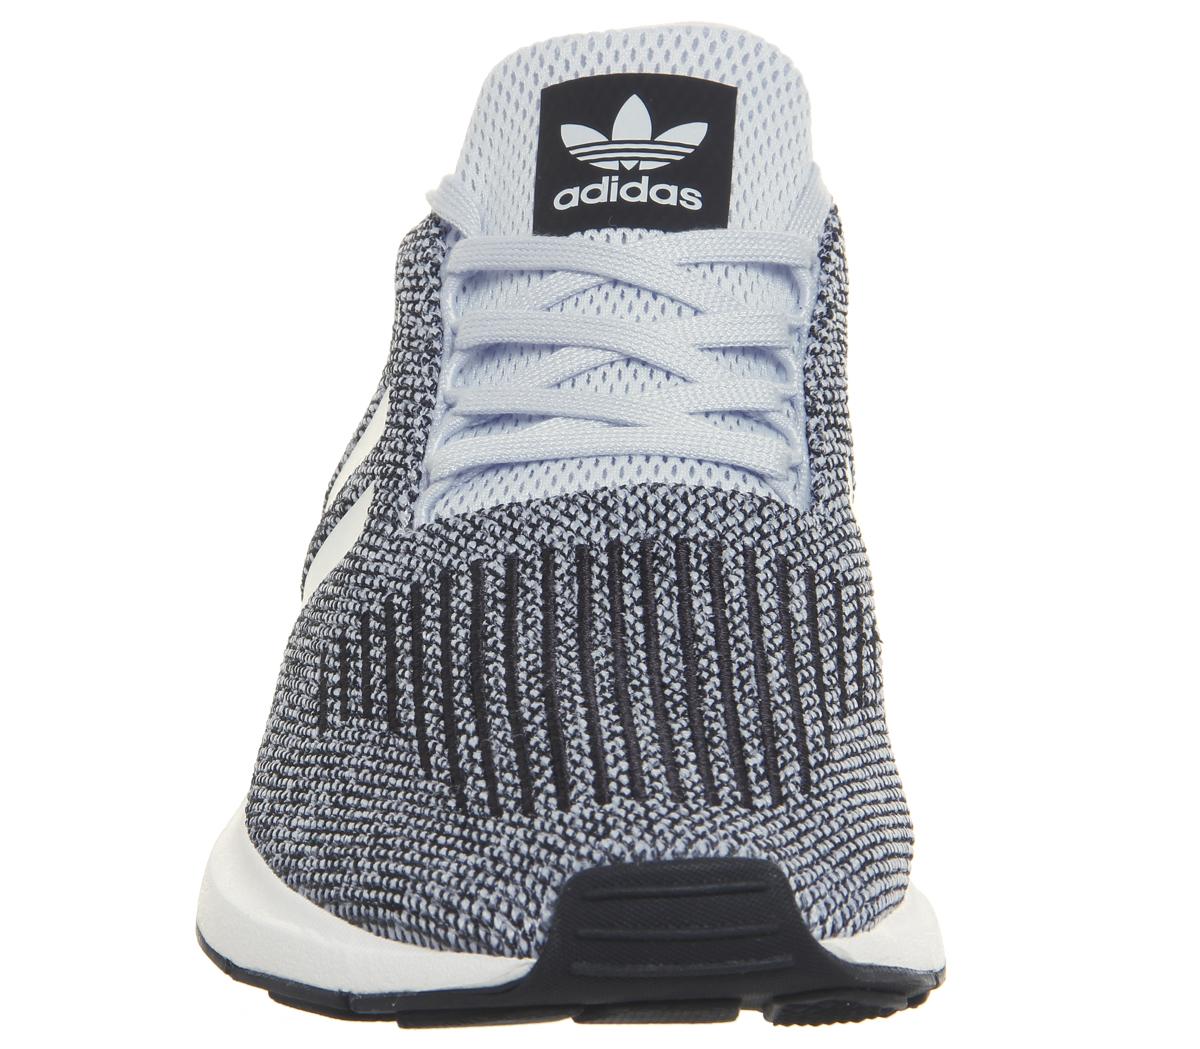 a00b10d11e438 Mens Adidas Swift Run Trainers AERO BLUE WHITE Trainers Shoes